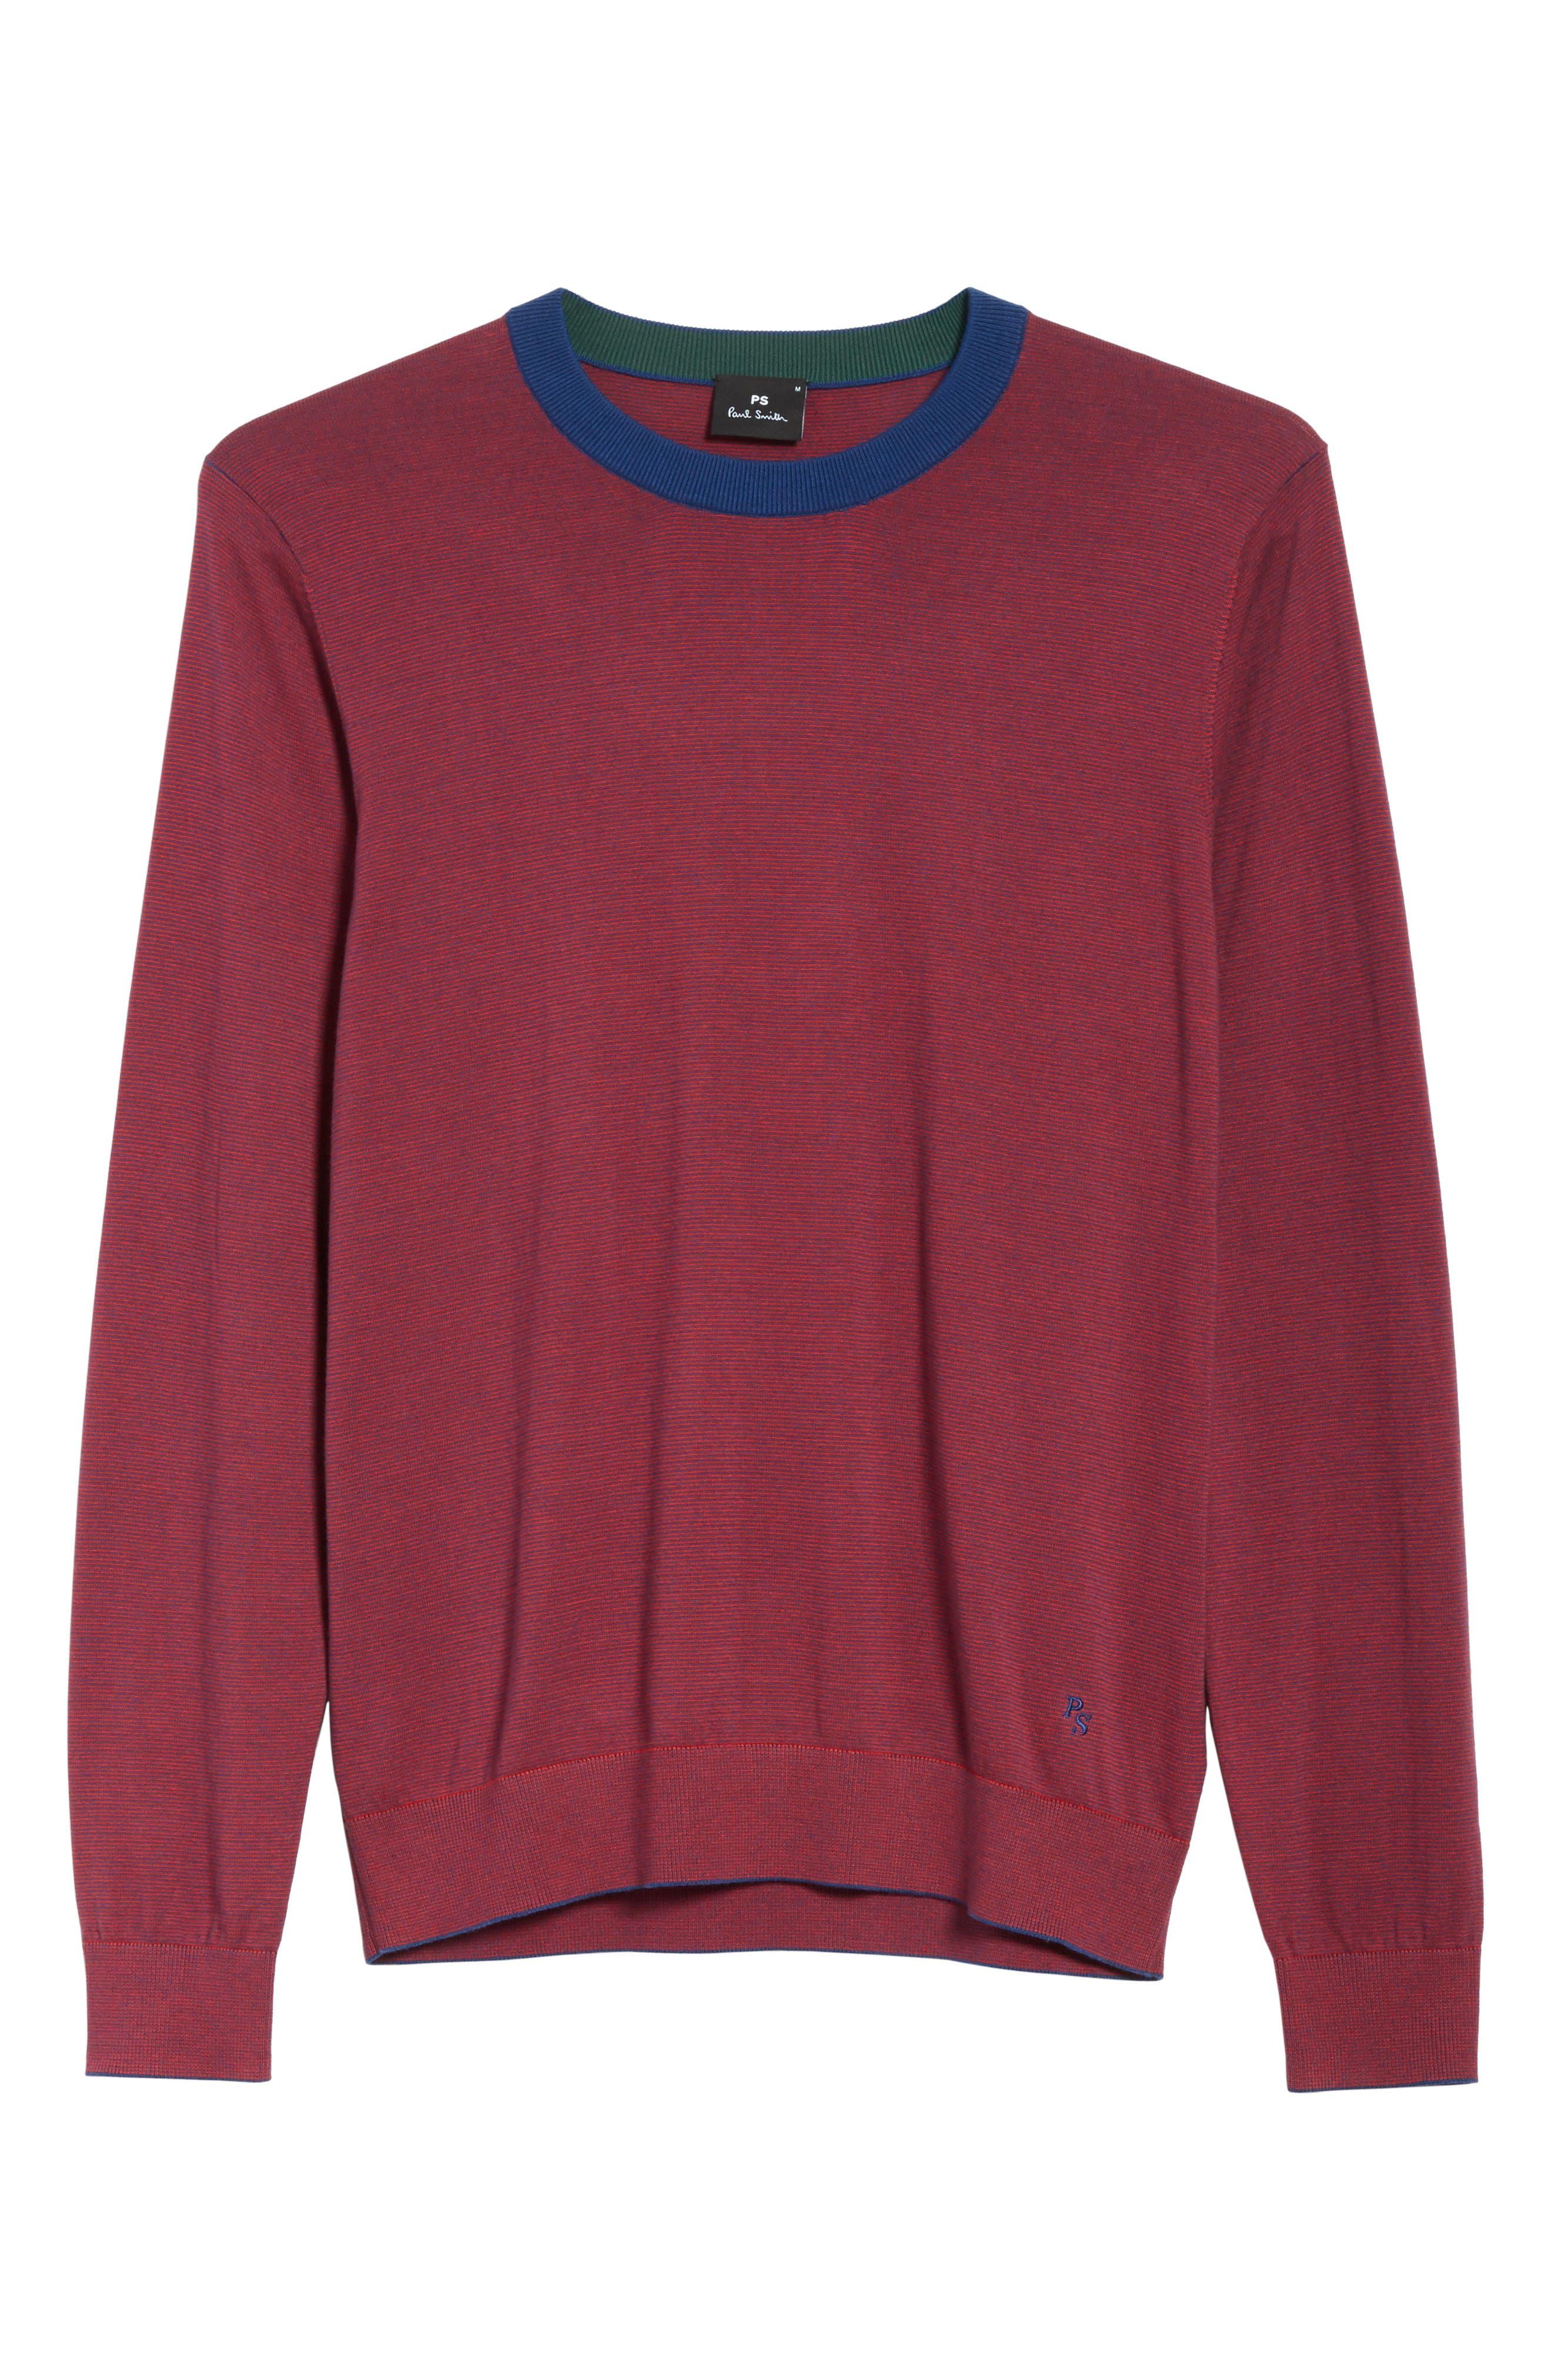 Ministripe Crewneck Sweater,                             Alternate thumbnail 6, color,                             Red